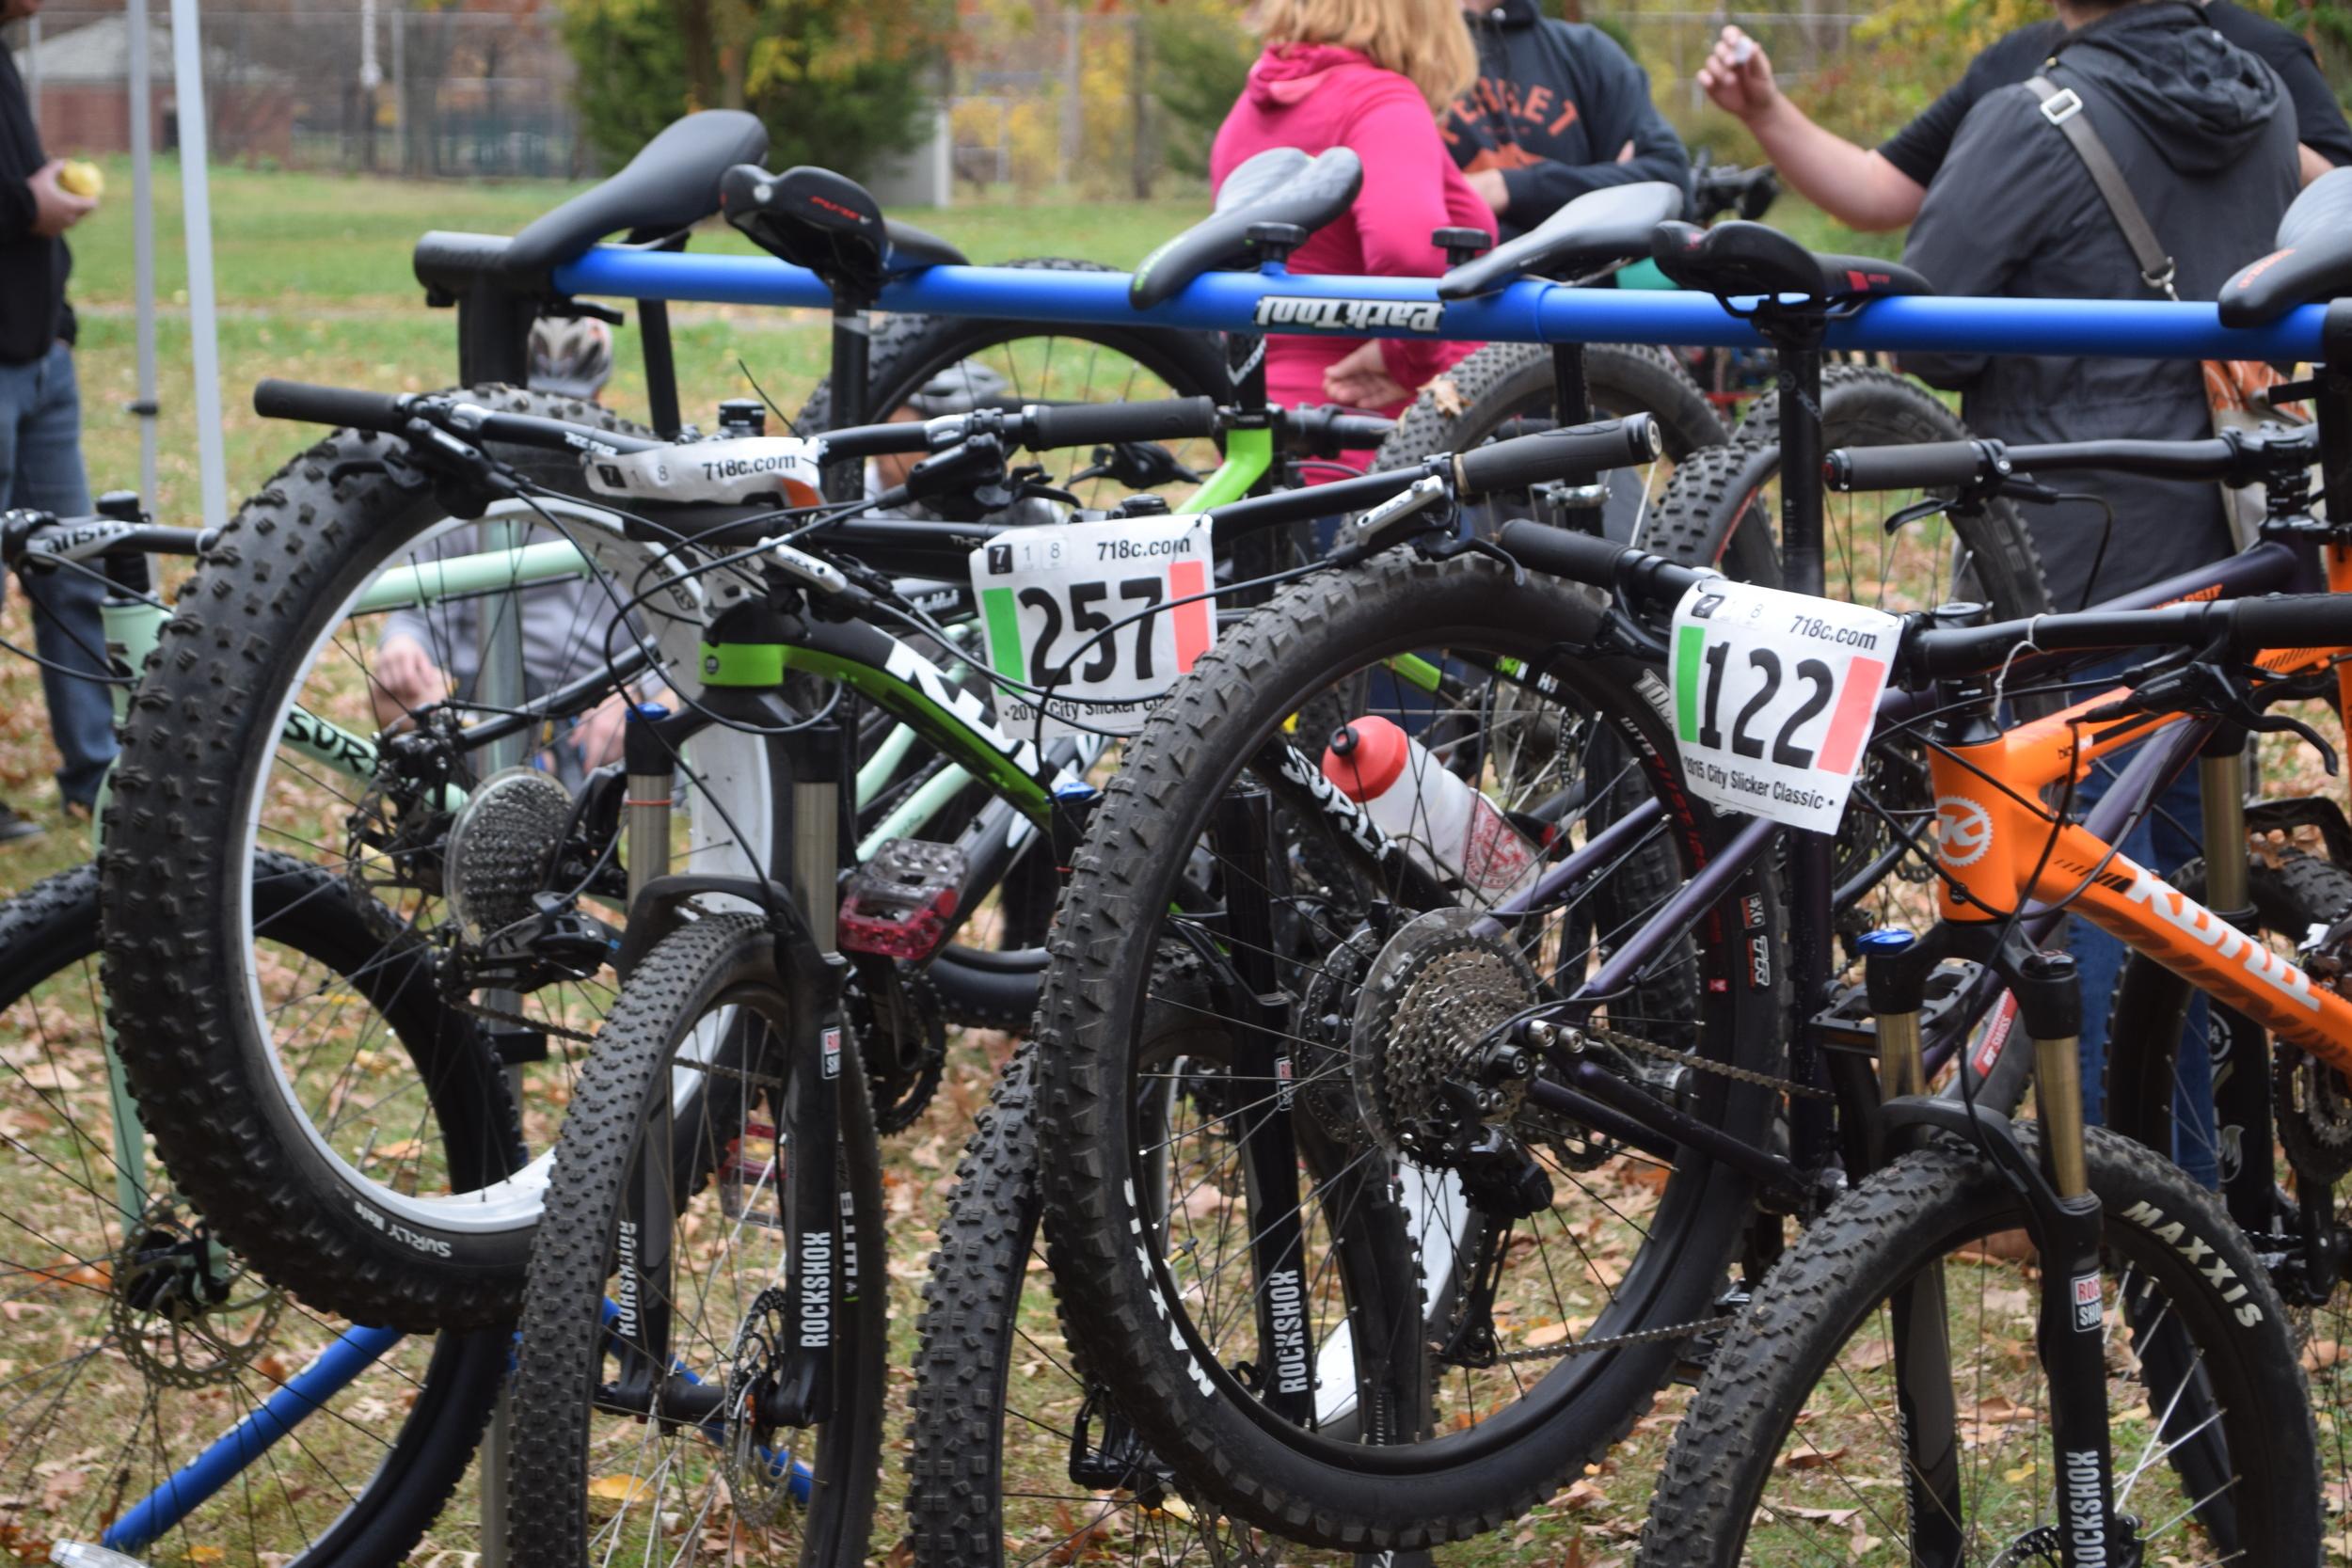 Photo courtesy of 718 Cyclery